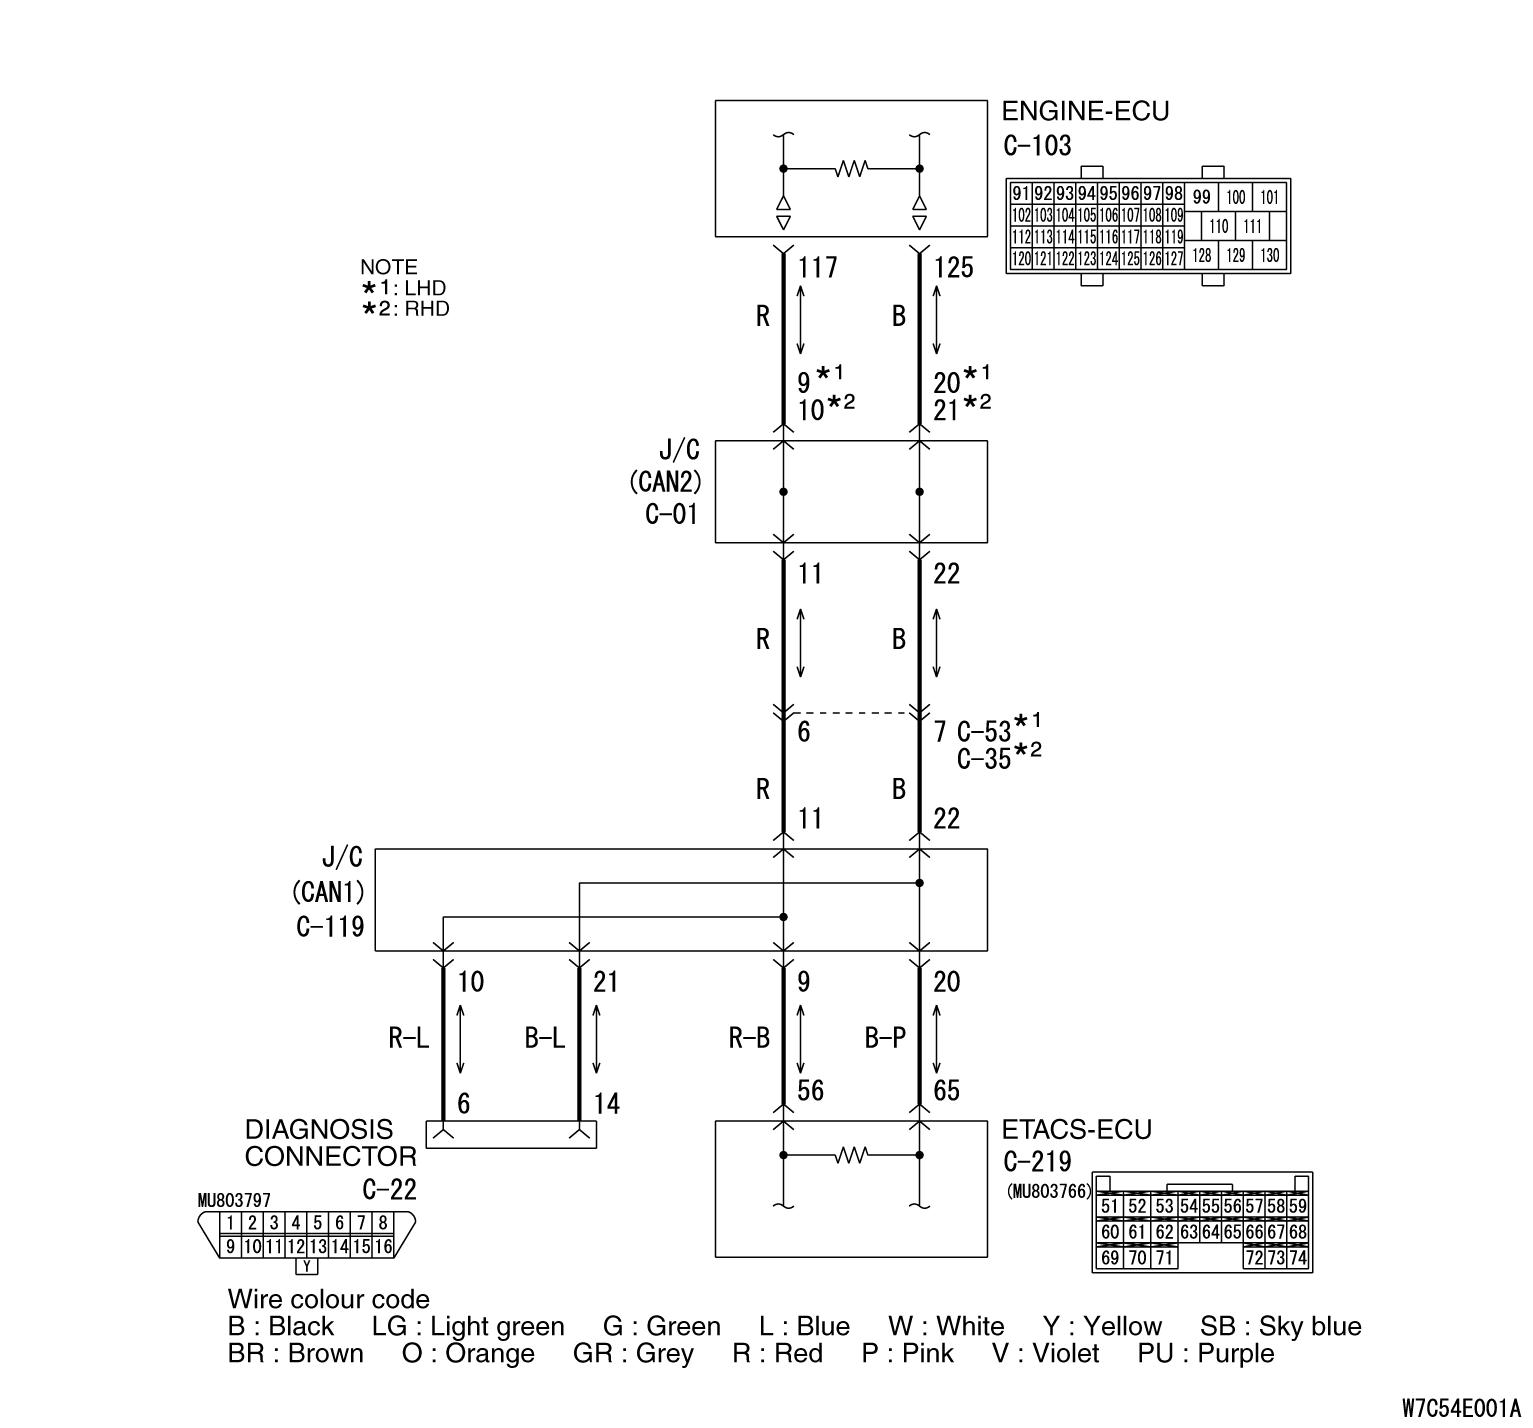 W C E A Eng on 2000 Gmc Sierra Wiring Diagram A Tow Plug